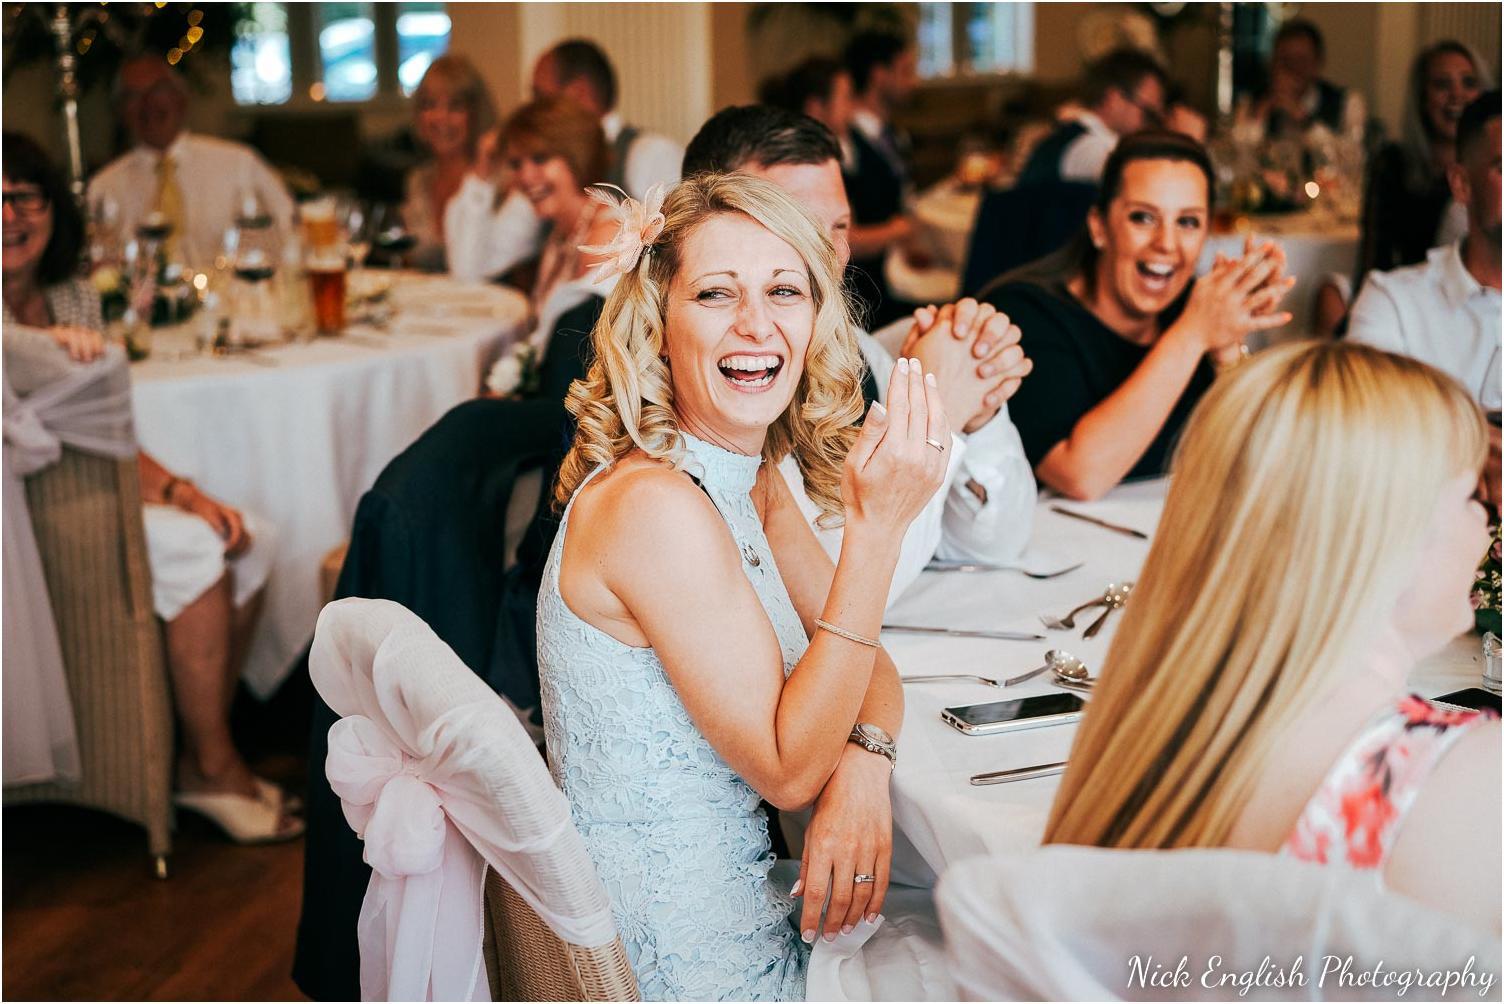 Mitton_Hall_Wedding_Photograph-119.jpg